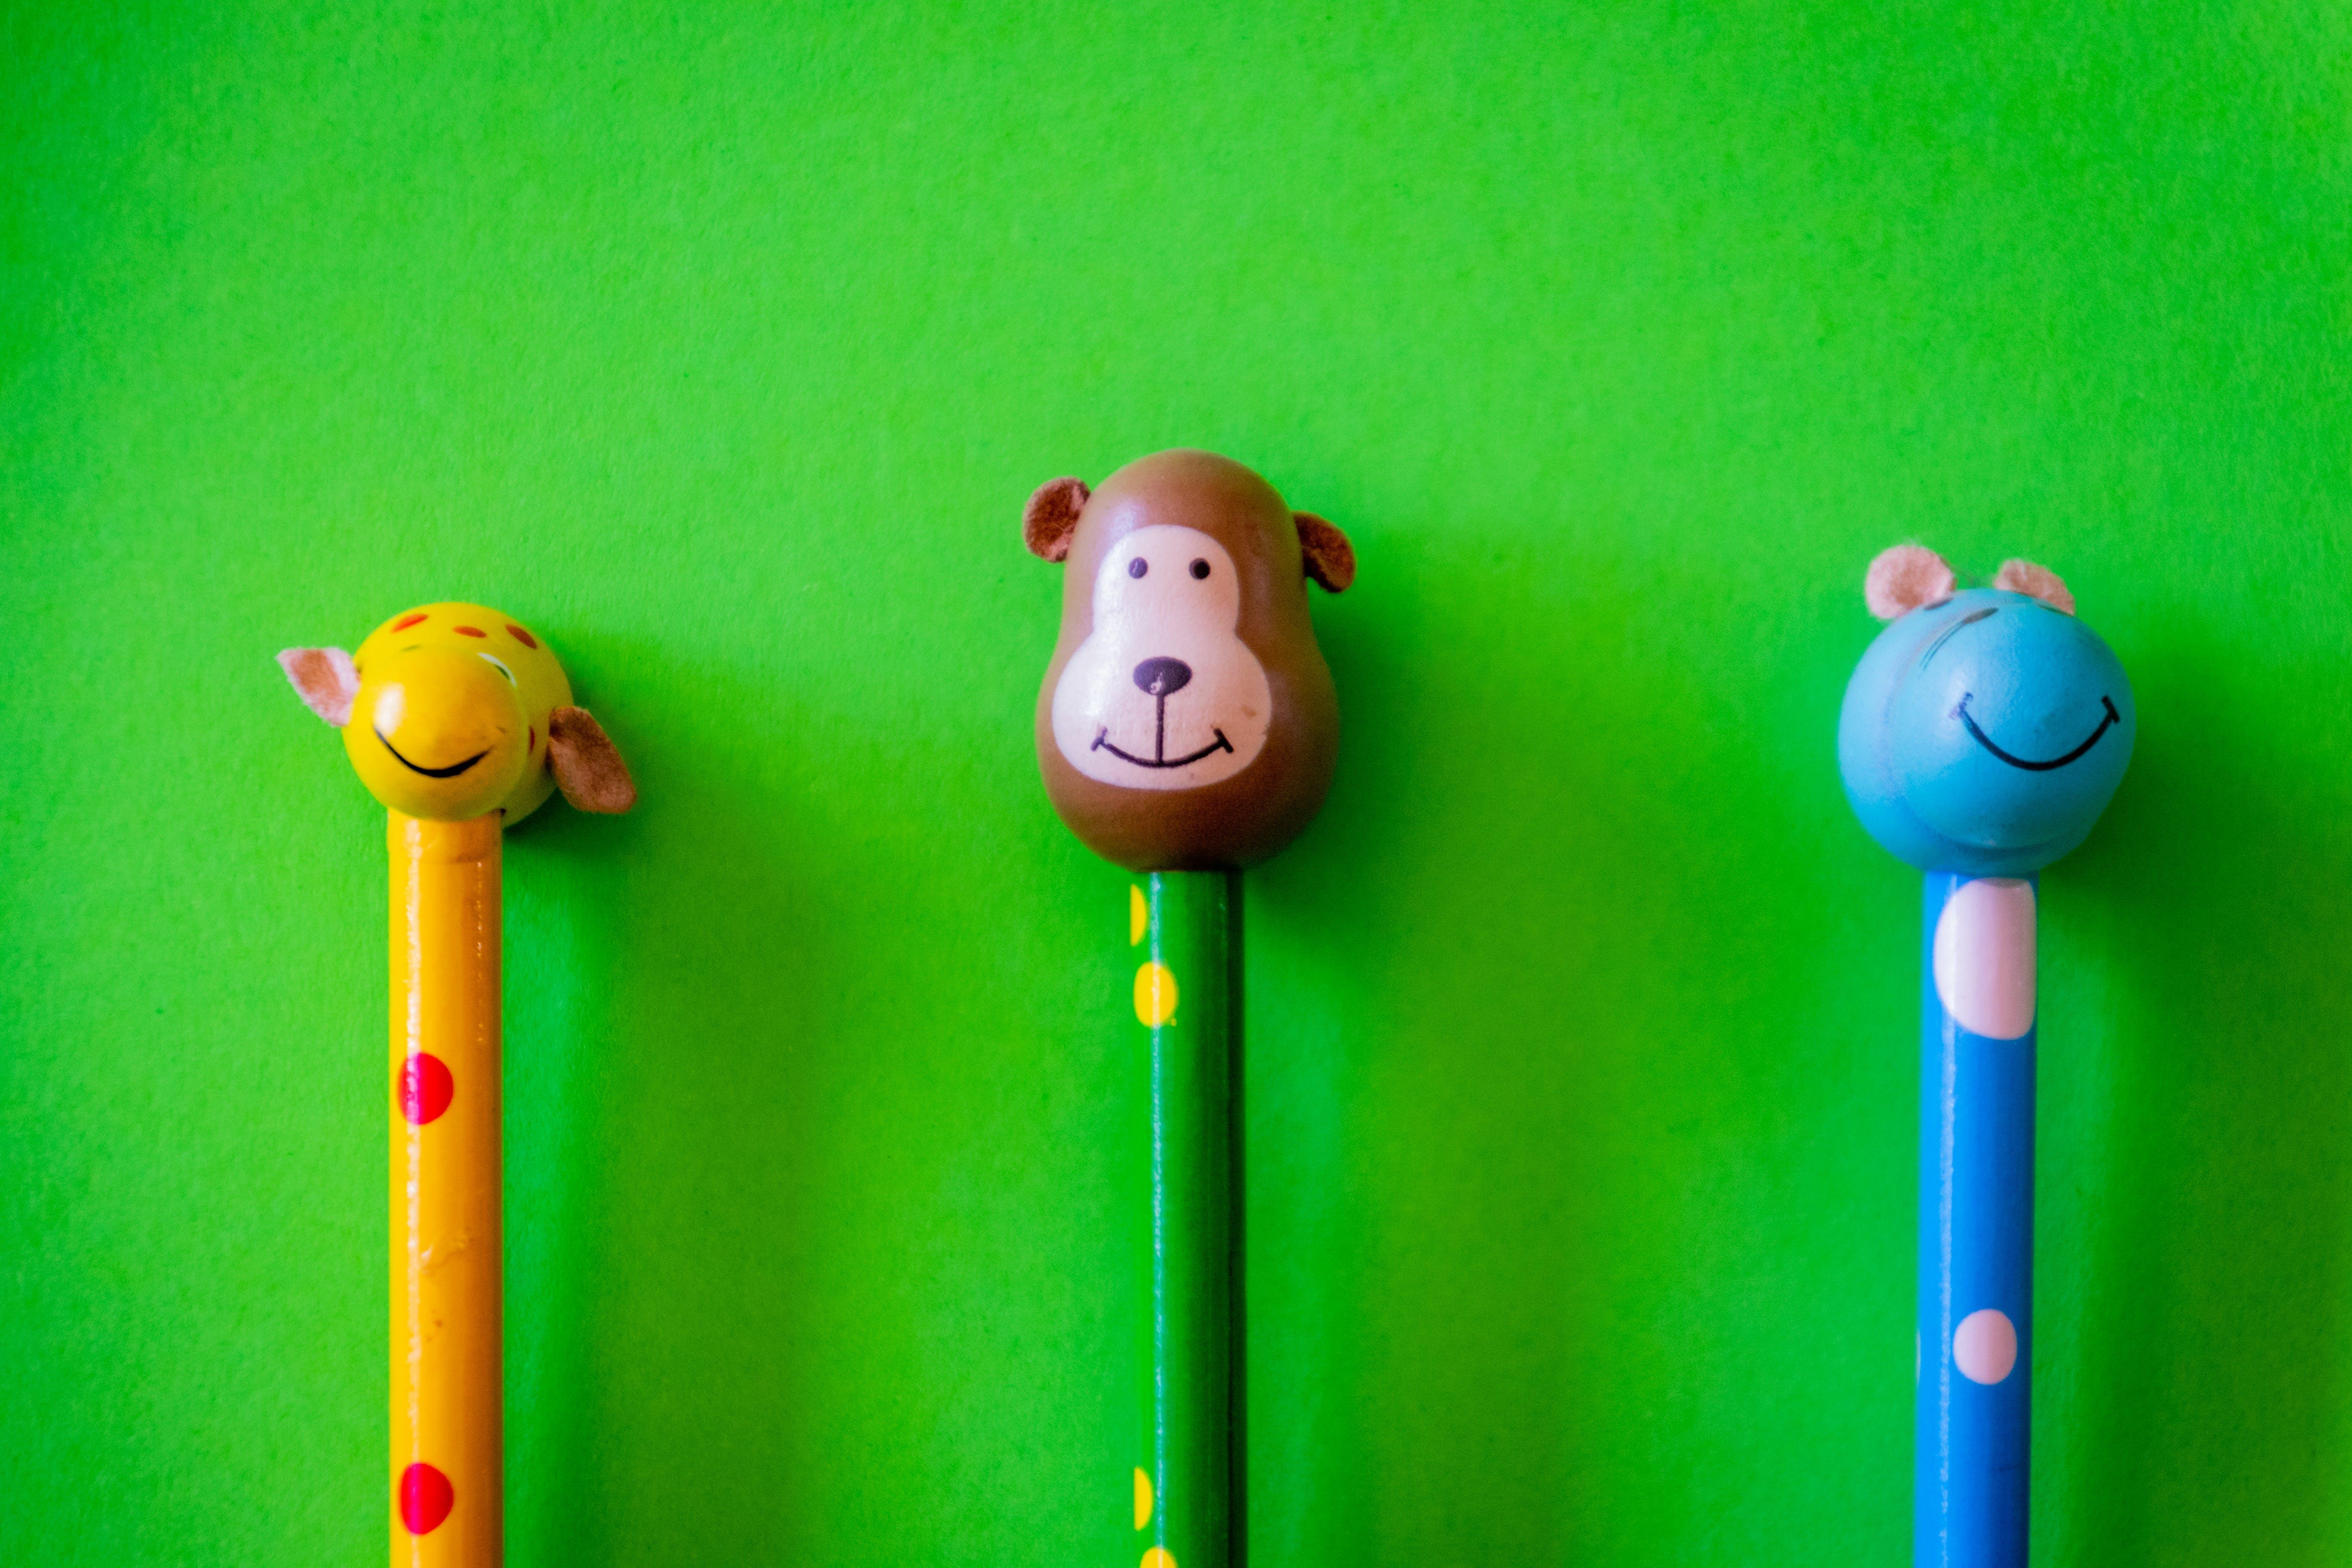 Three Animal Head Pencils